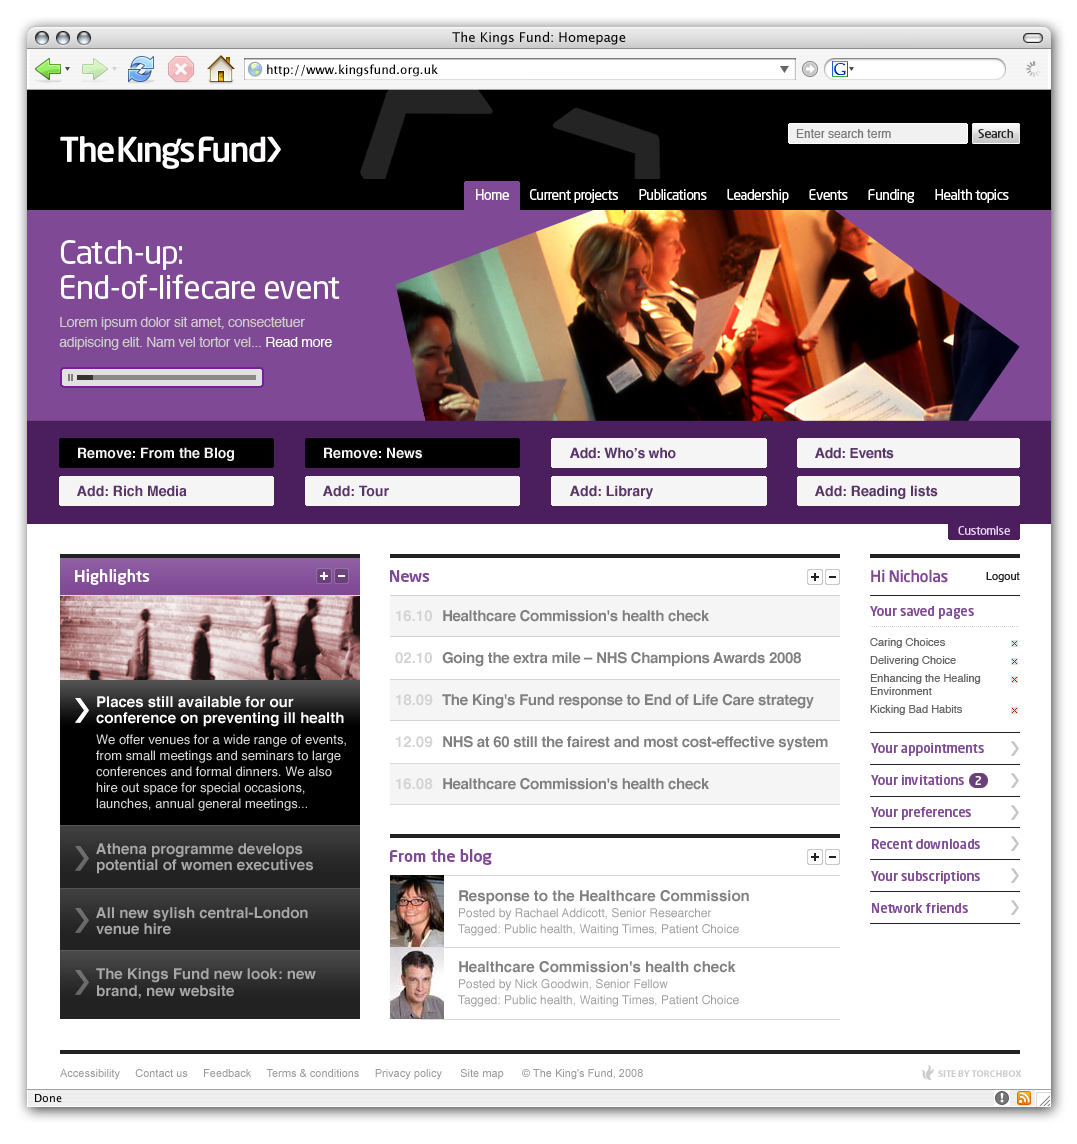 Kingsfund homepage open